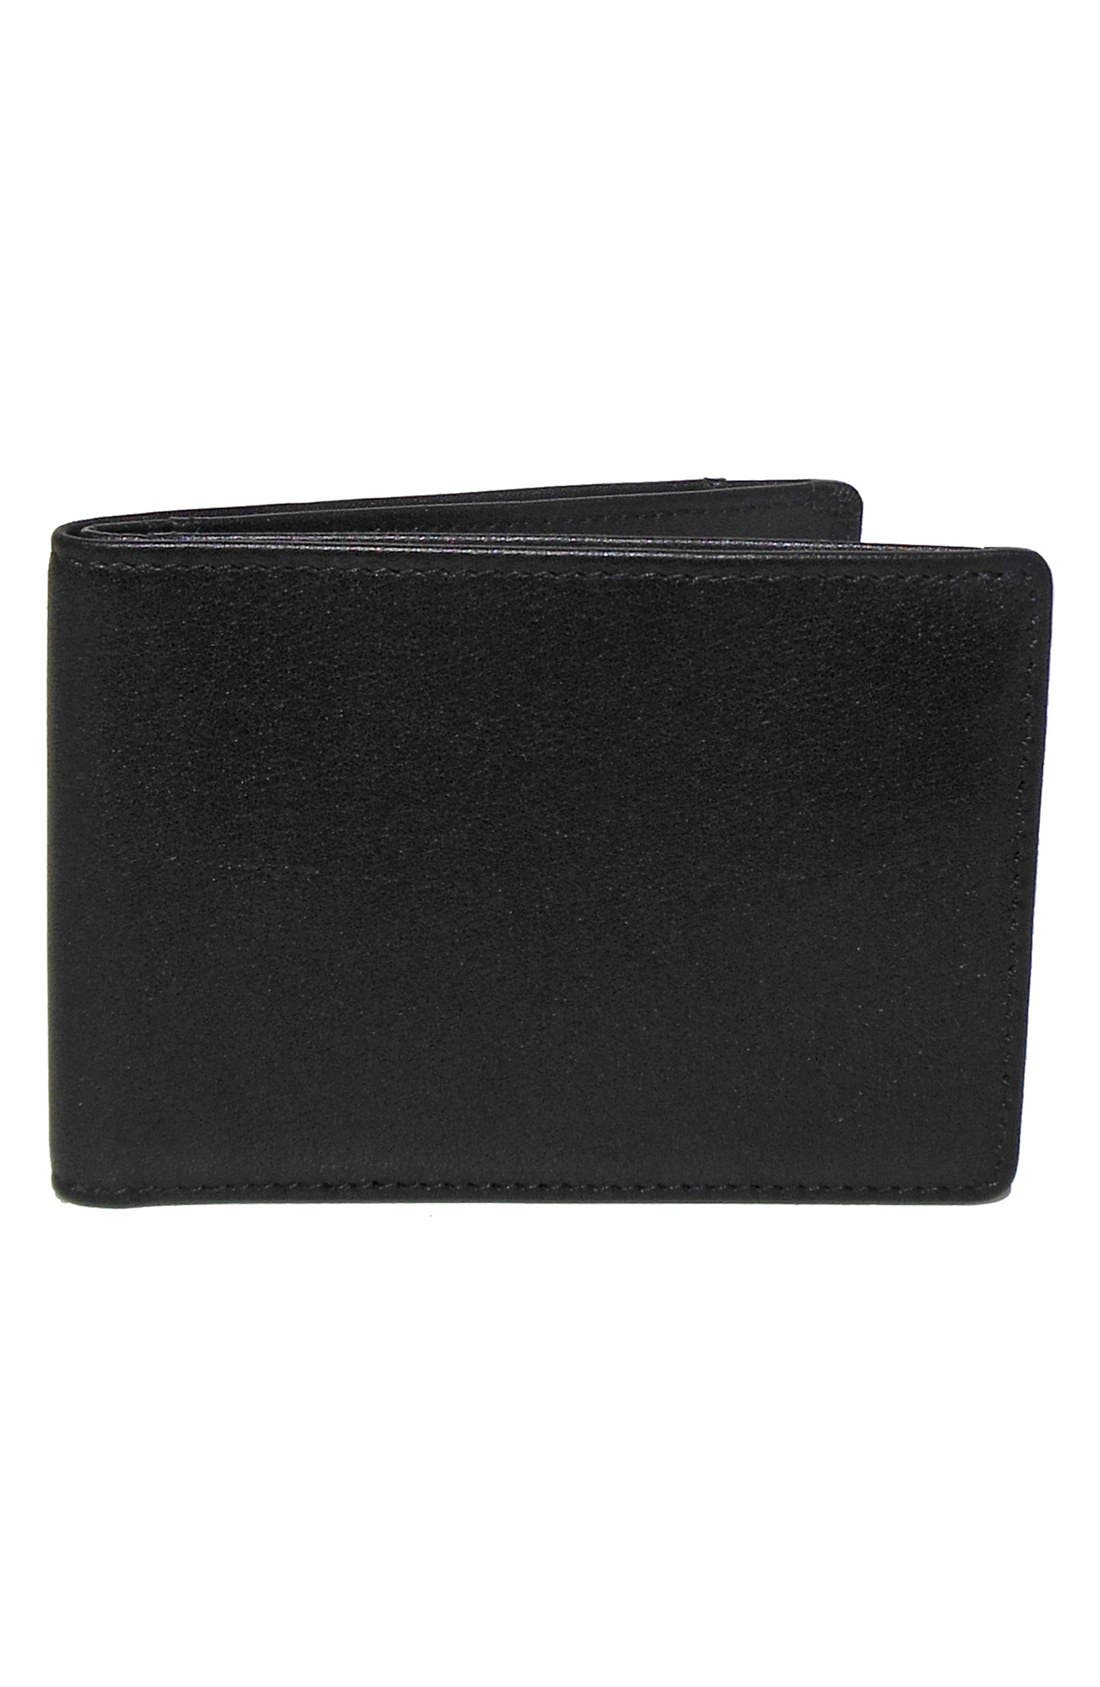 'Grant Slimster' RFID Blocker Leather Wallet,                         Main,                         color, Black/ Grey